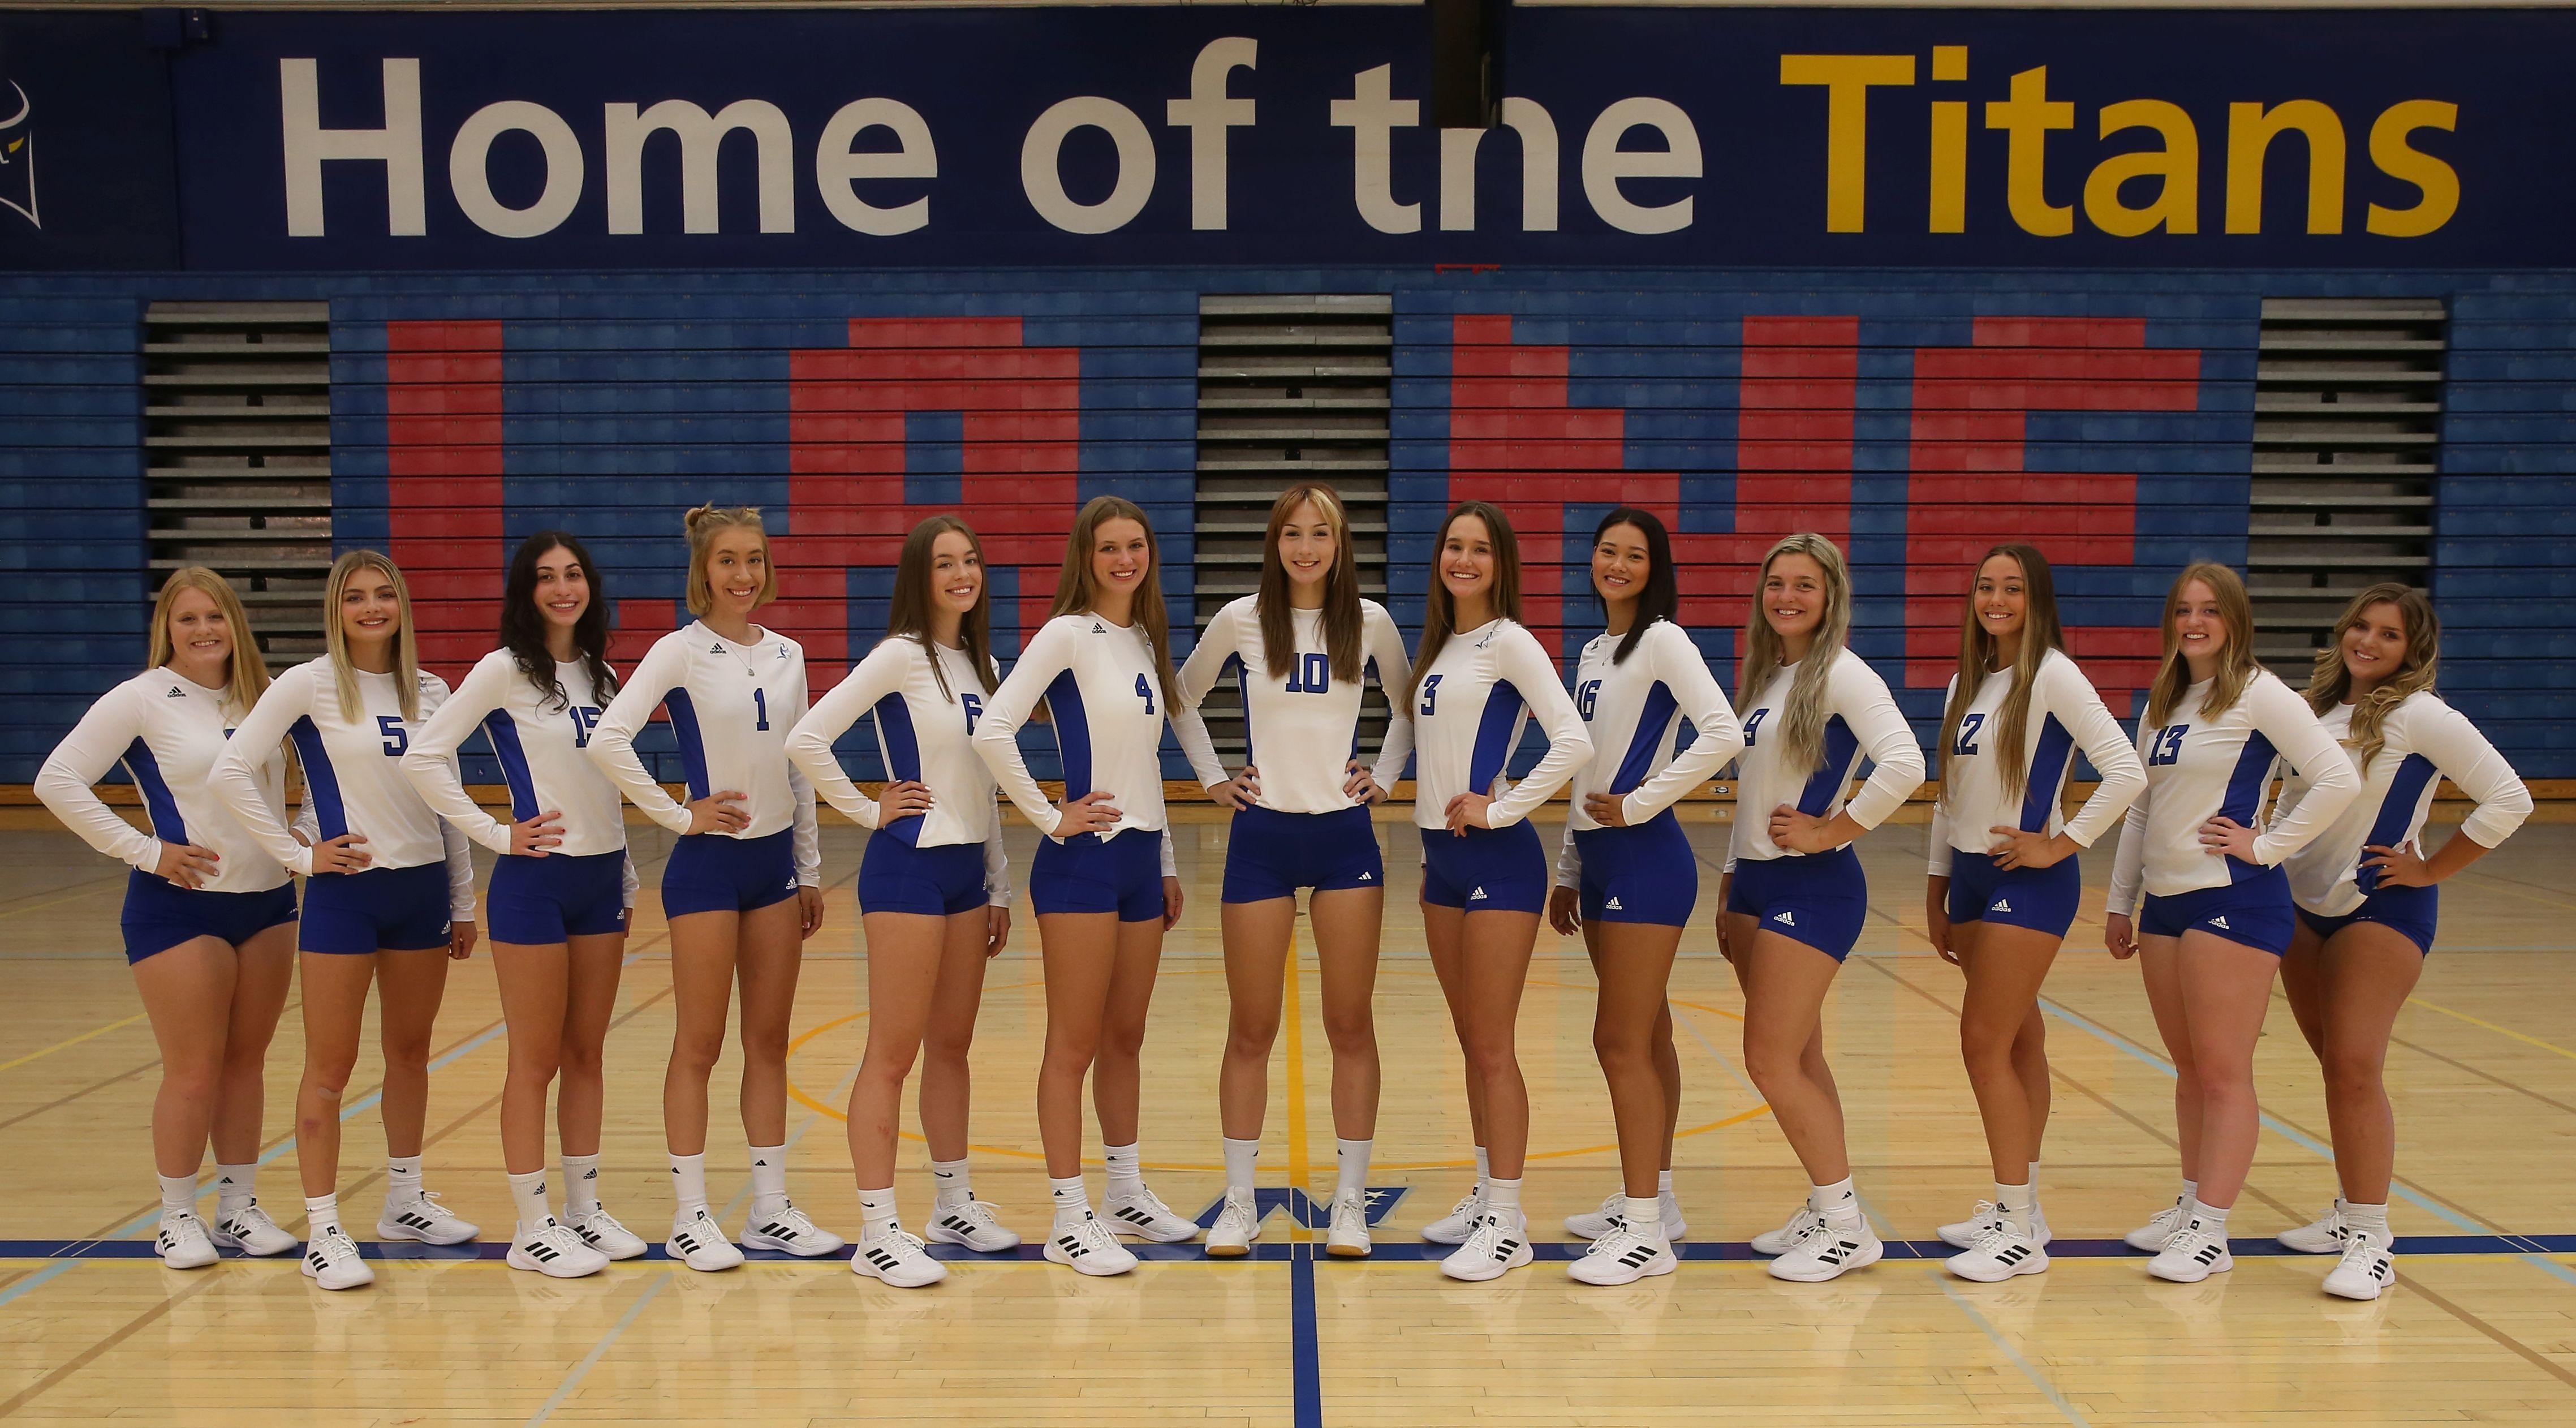 Lane team photo